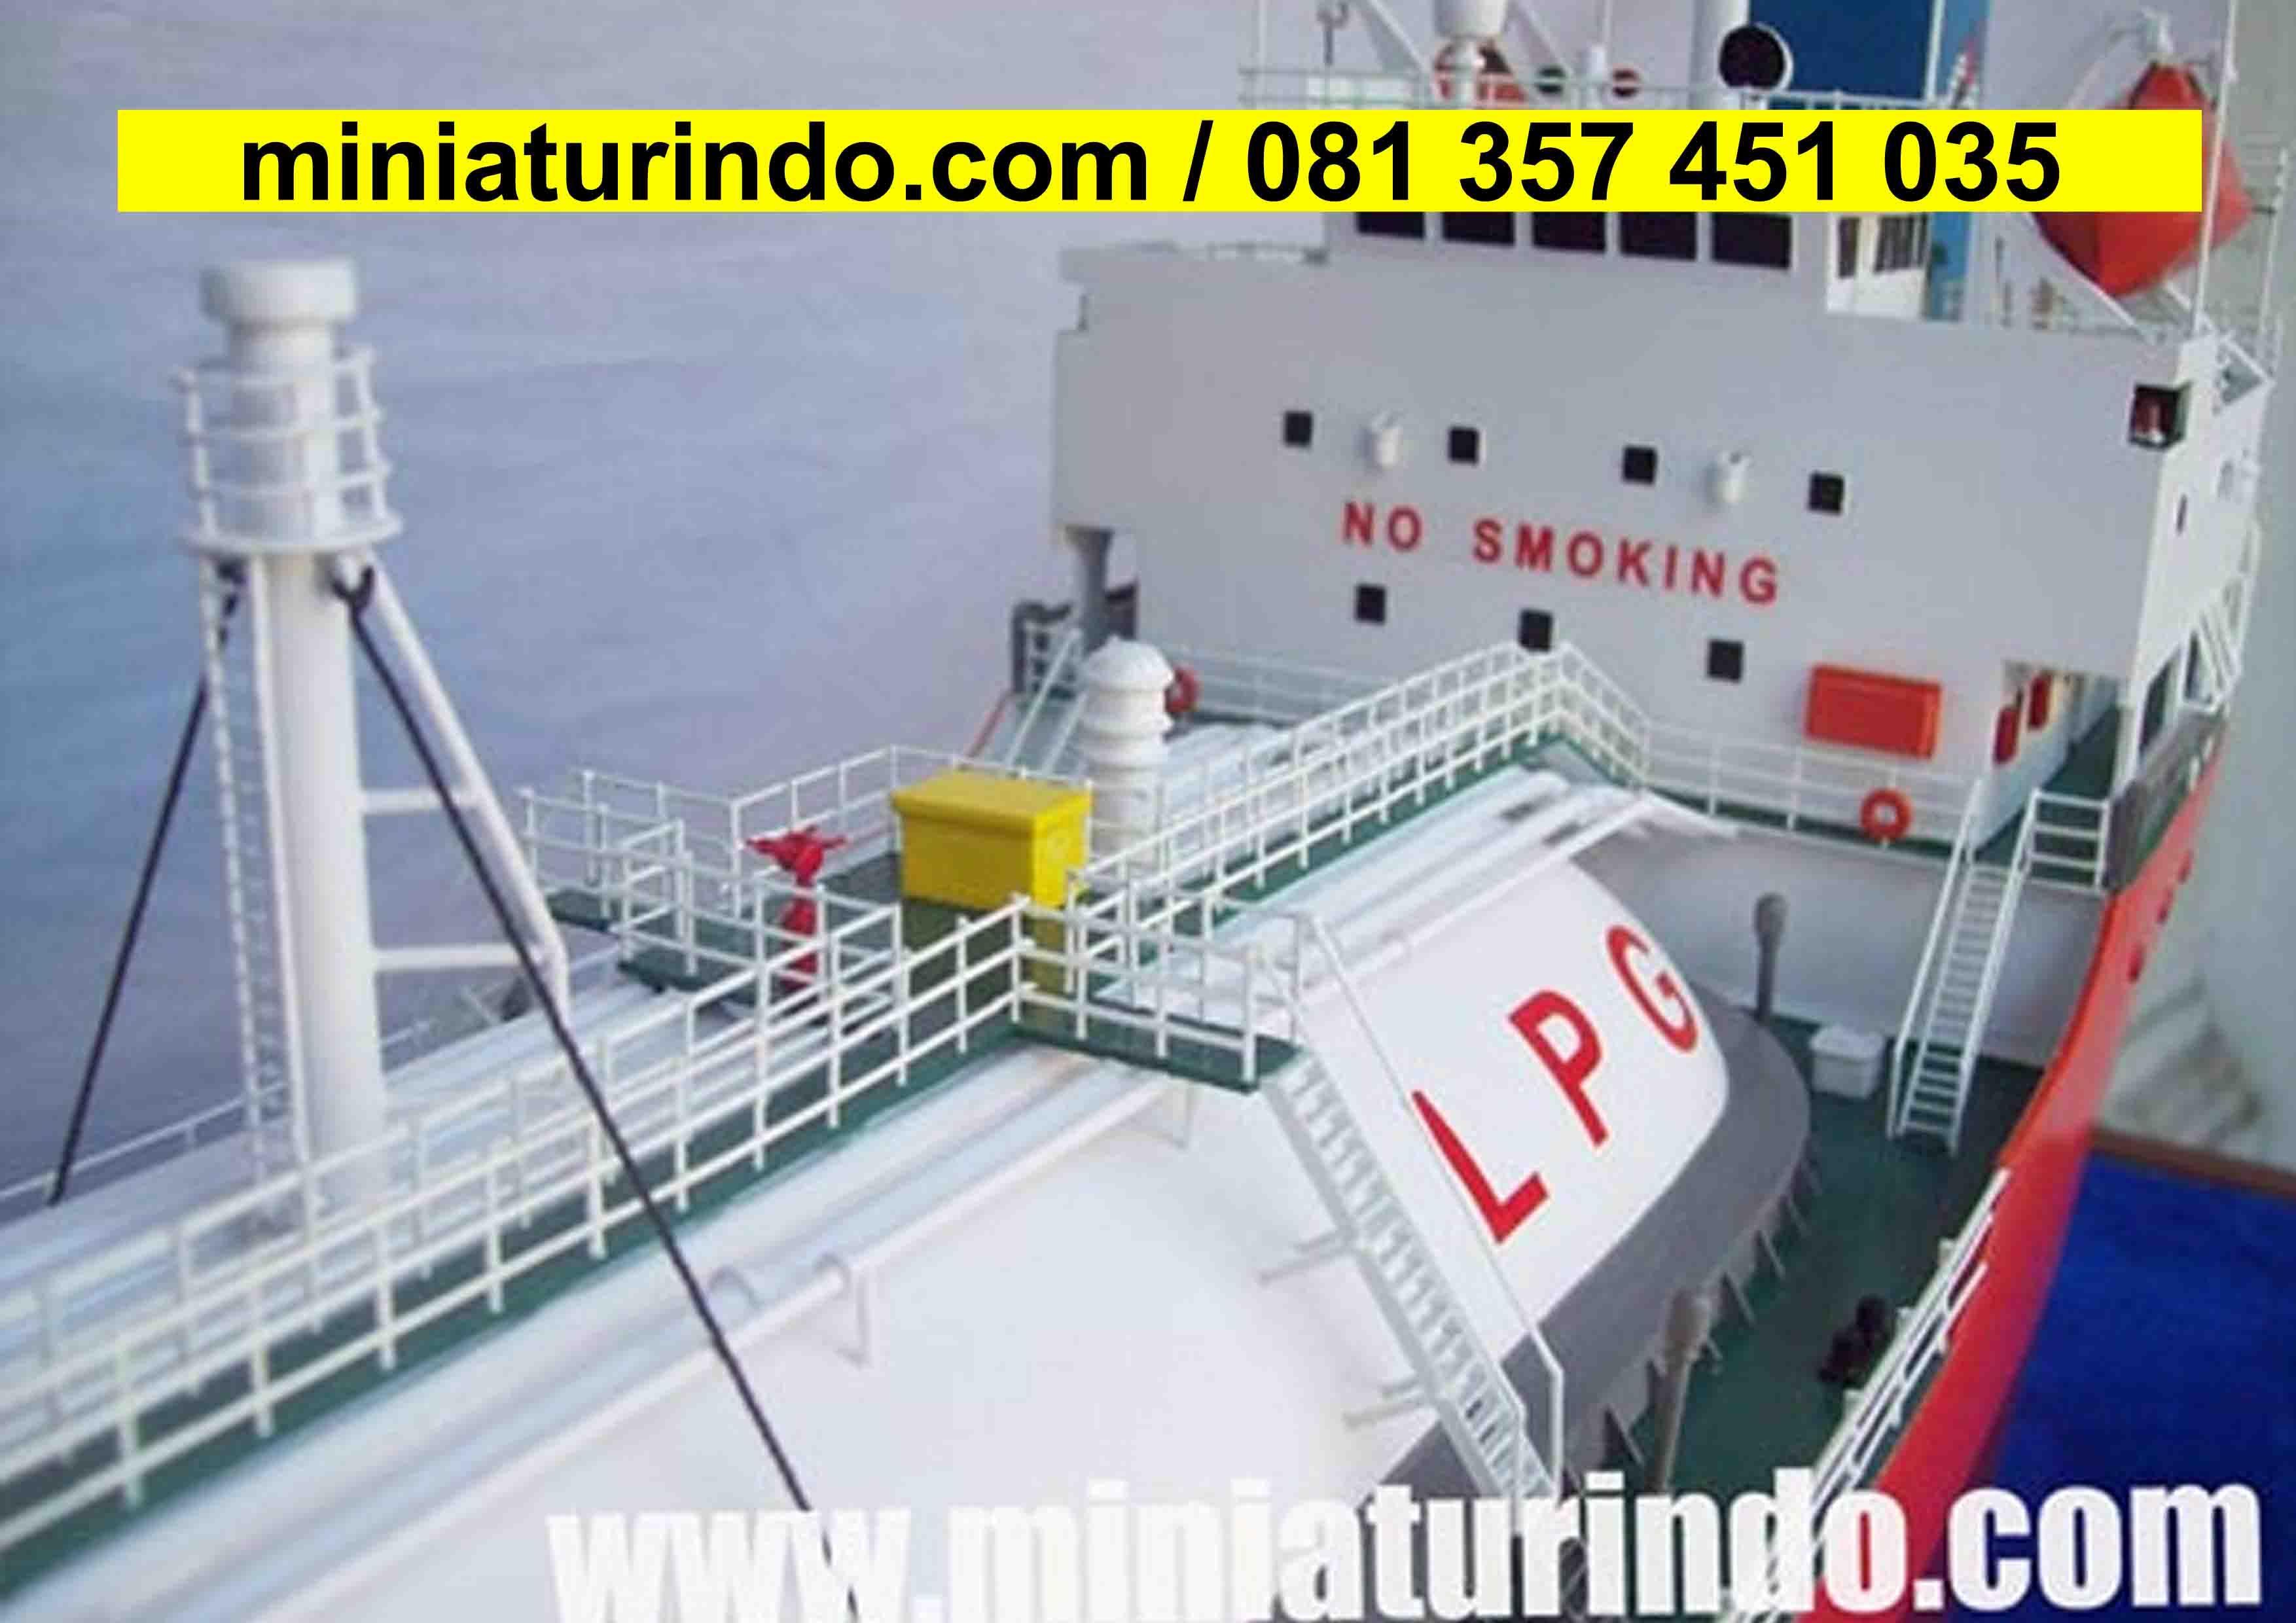 Membuat Miniatur Usaha Miniatur Jual Miniatur Kapal Perang Jual